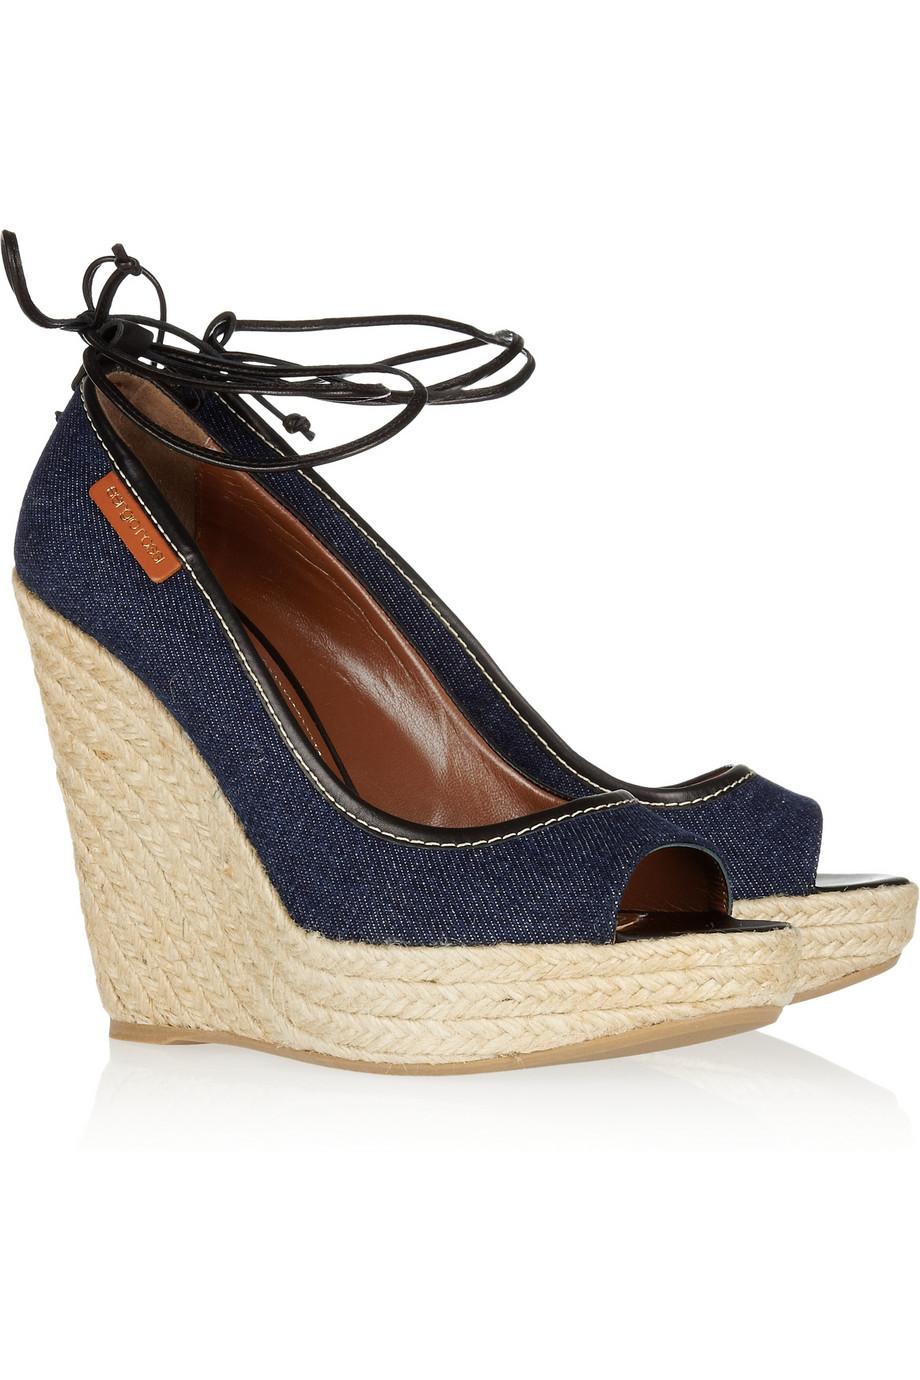 shoeniverse sergio rossi blue denim wedge sandals on sale. Black Bedroom Furniture Sets. Home Design Ideas